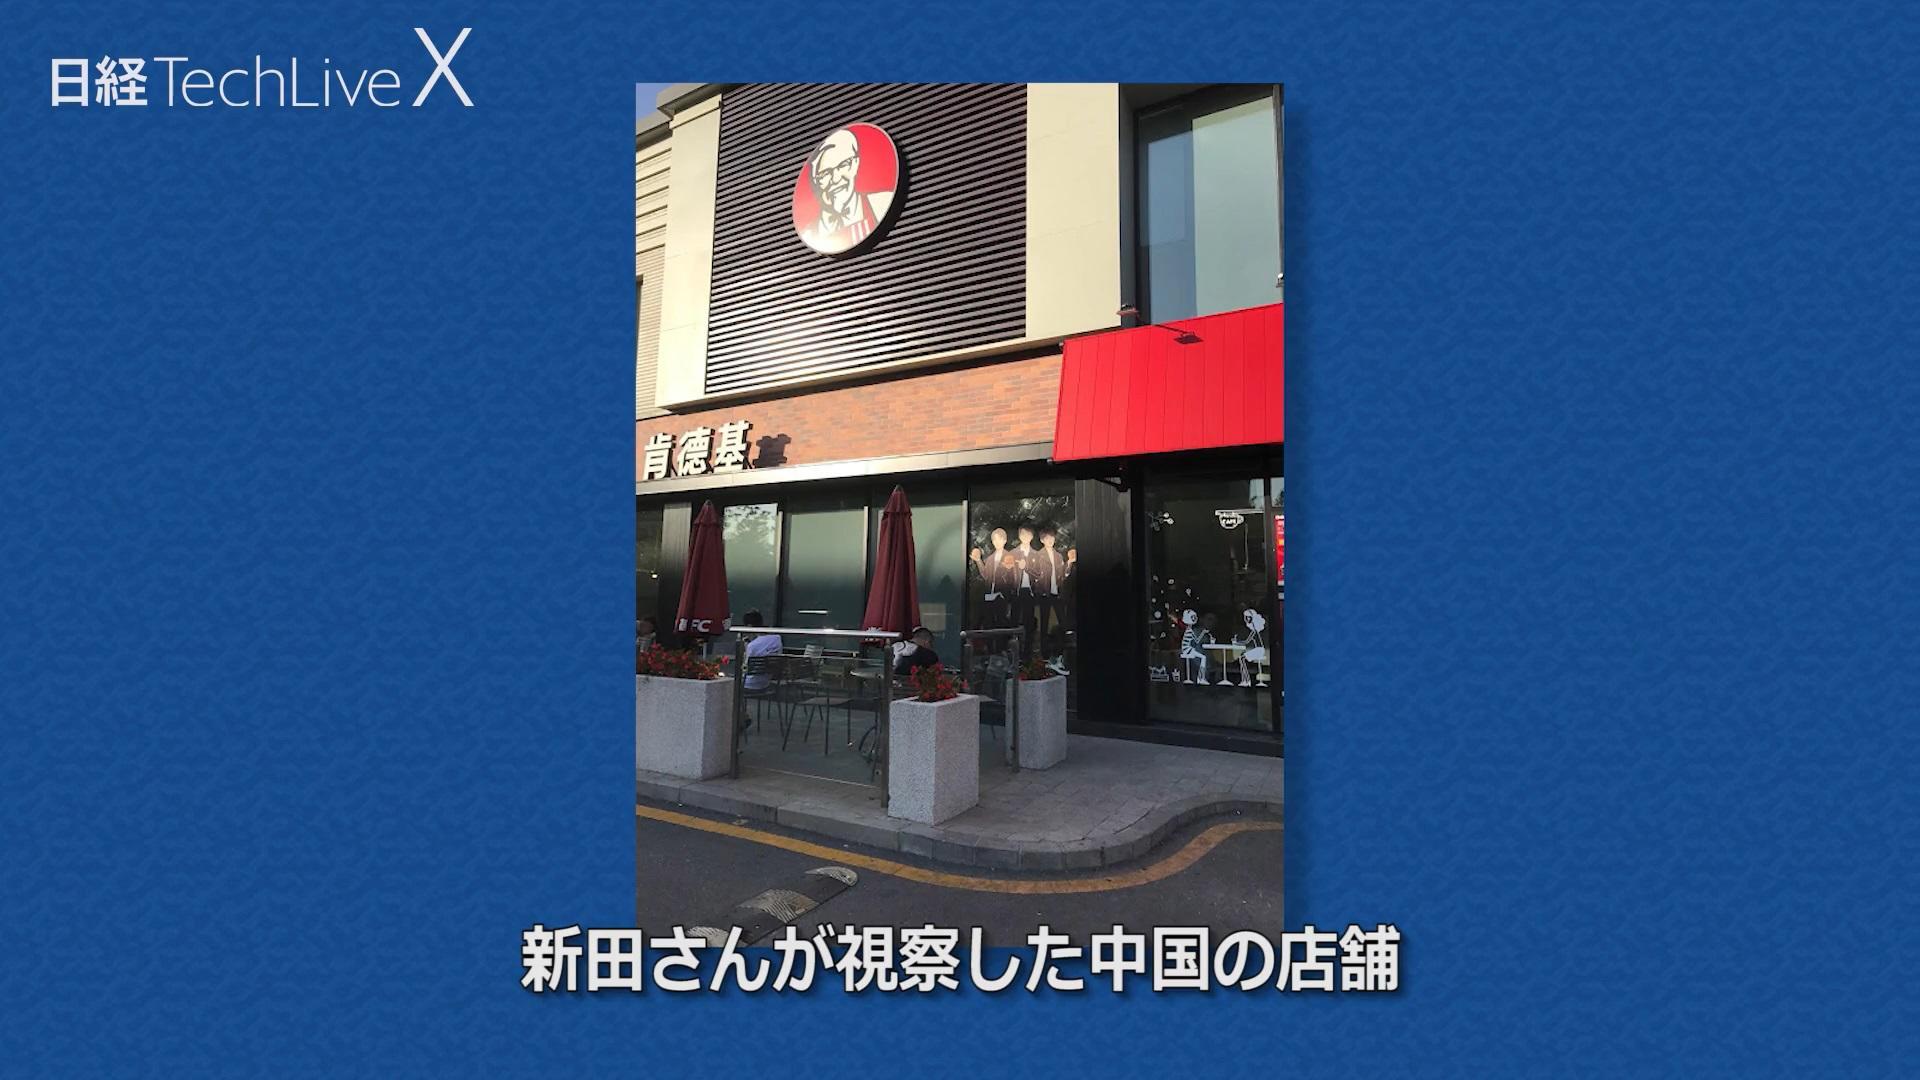 20180808_nikkeitlx05_13.jpg